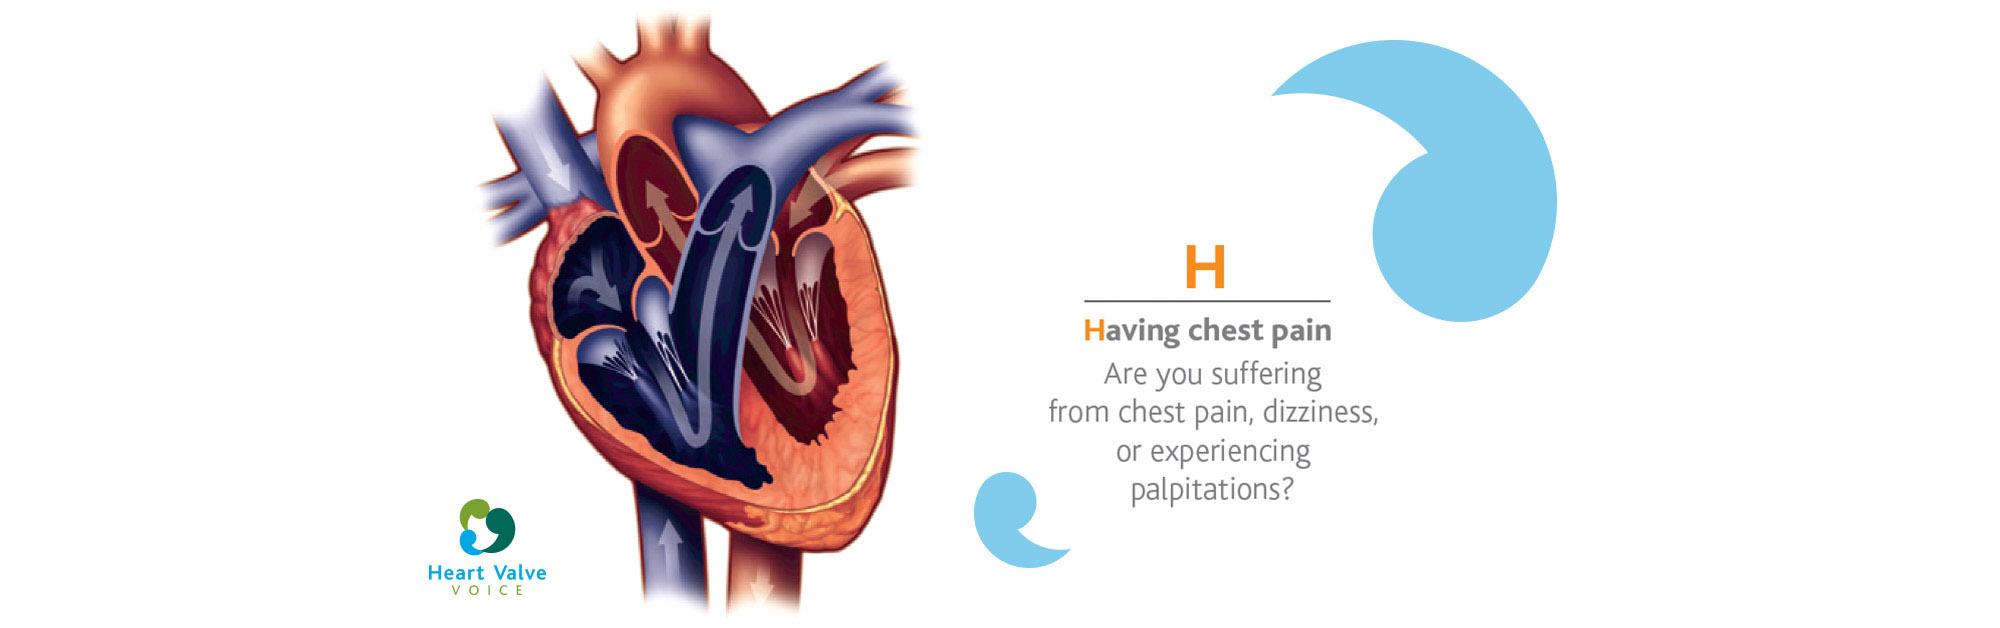 Heart check - H copy 2.jpg